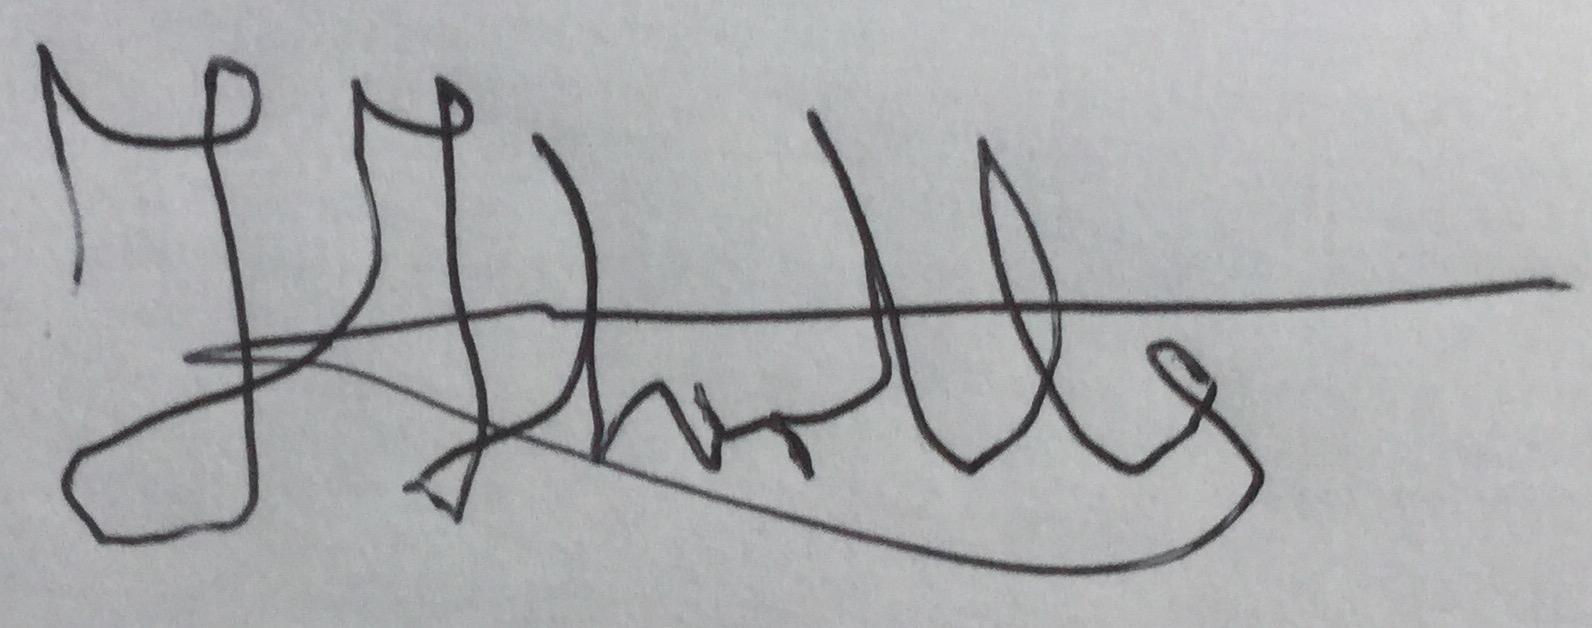 Felicity Thirtle's Signature